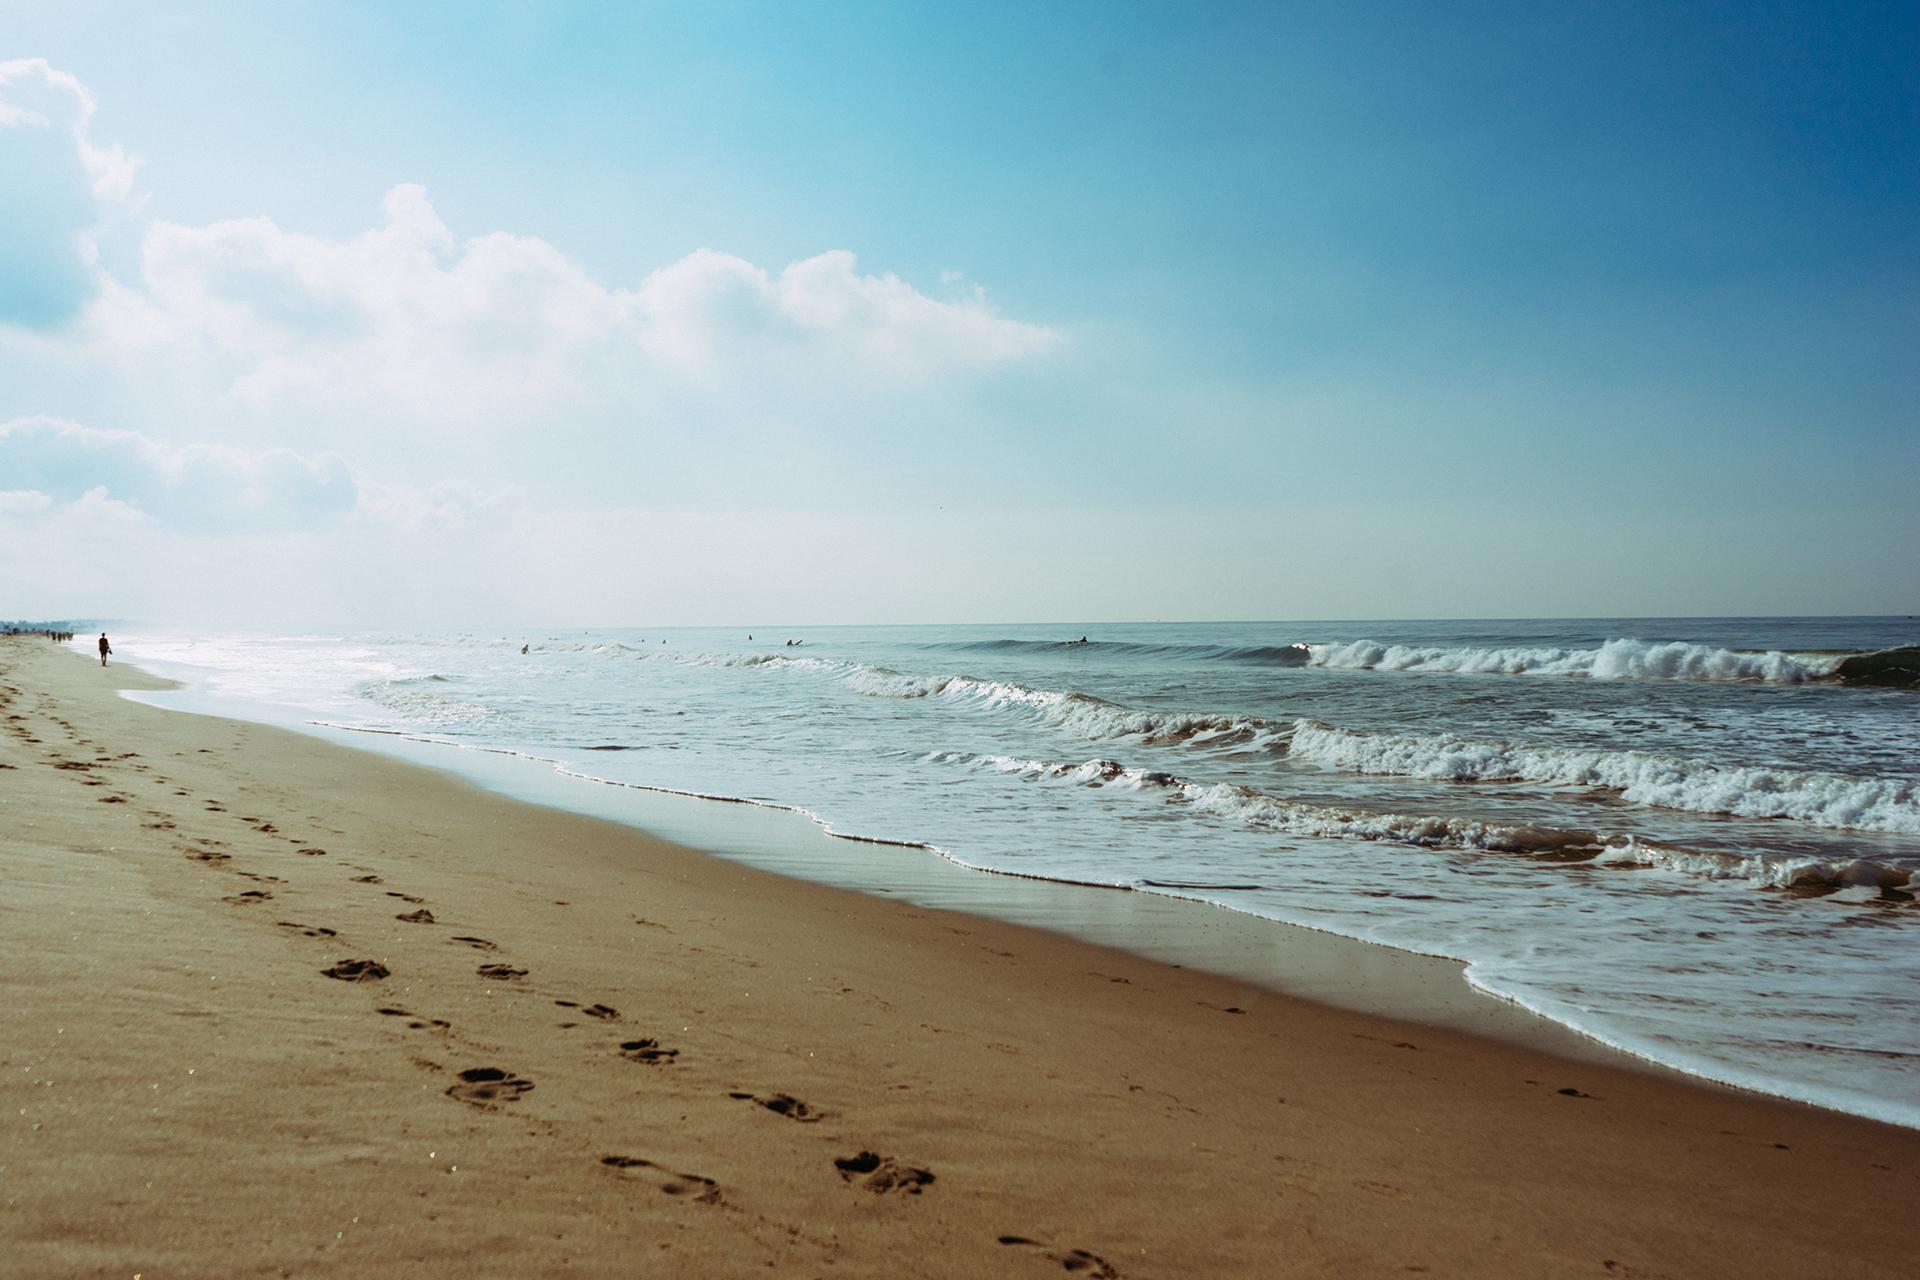 Chris Smith left speechless by TripAdvisor's Top 10 beaches